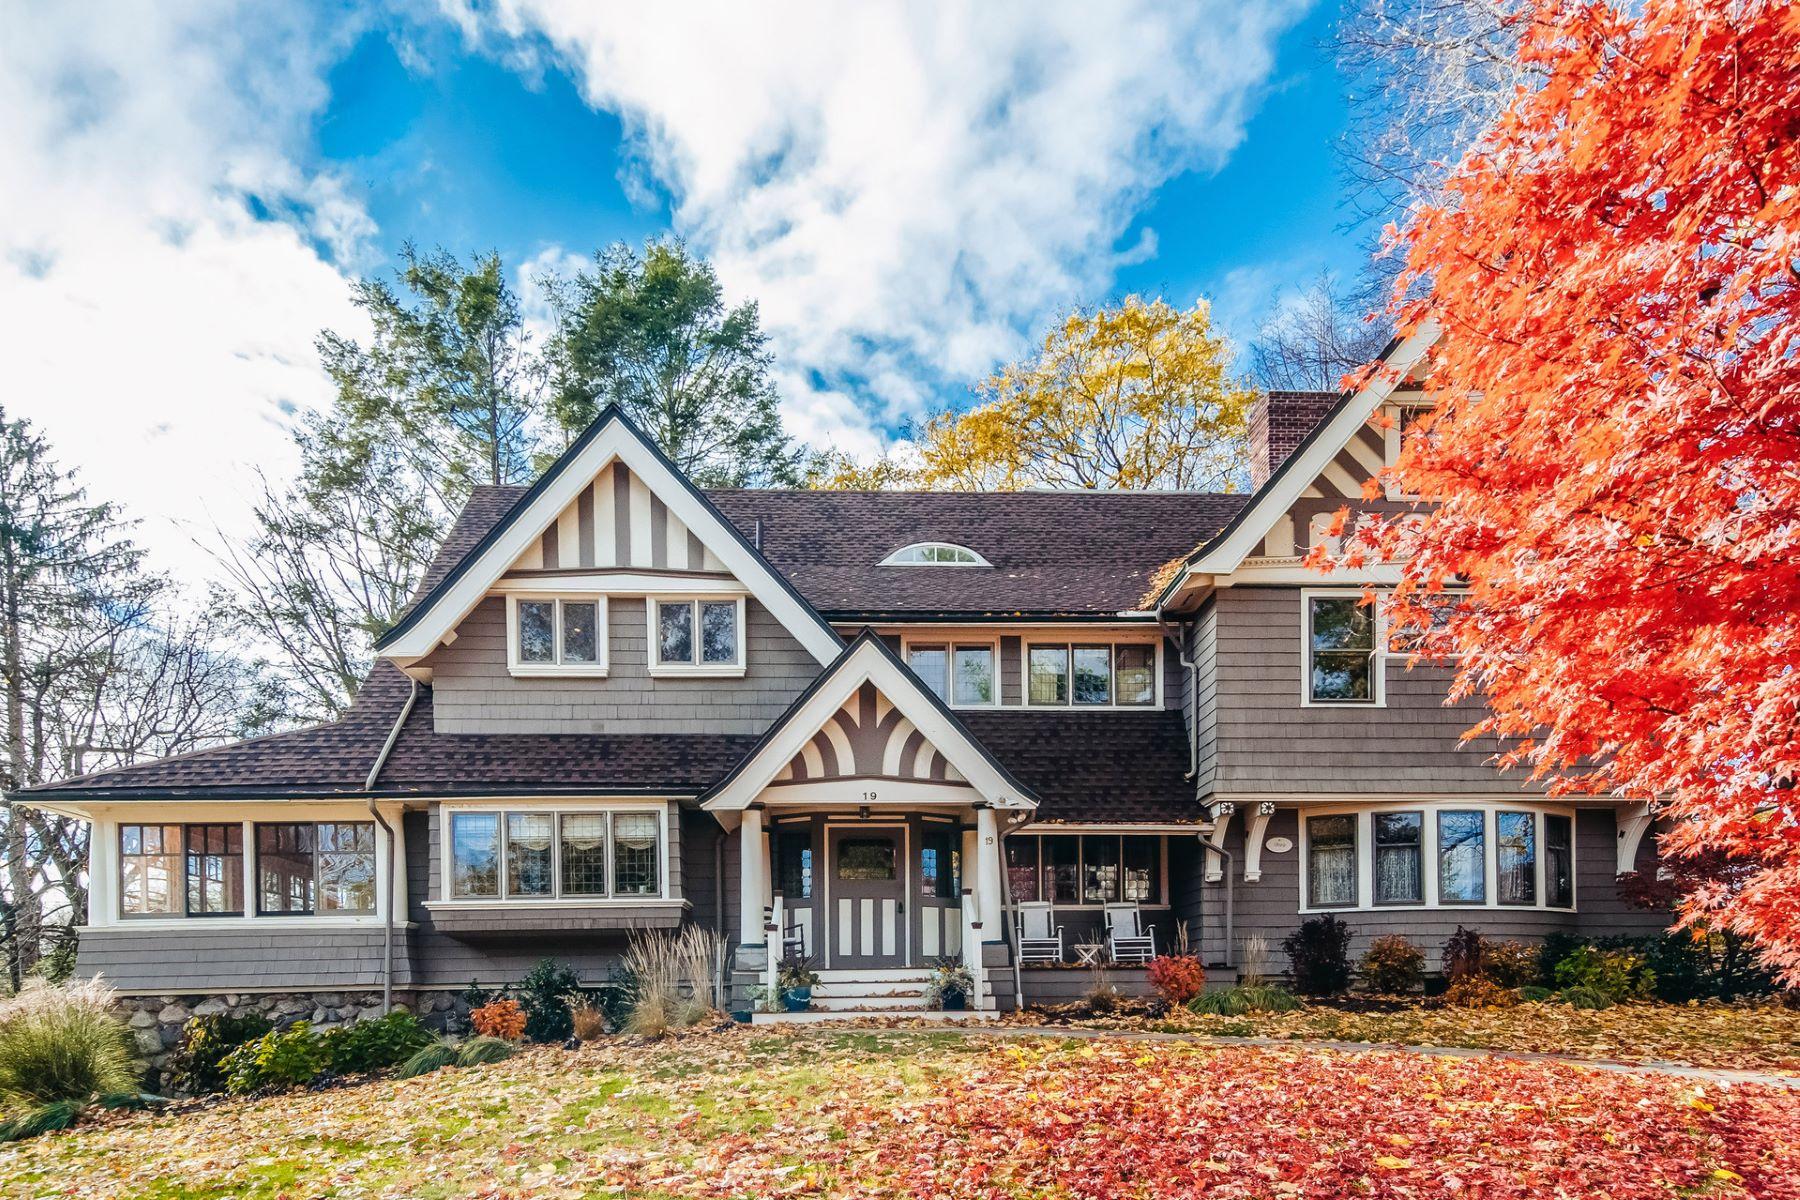 Single Family Home for Sale at 19 Burnham Road, Newton 19 Burnham Rd Newton, Massachusetts 02465 United States